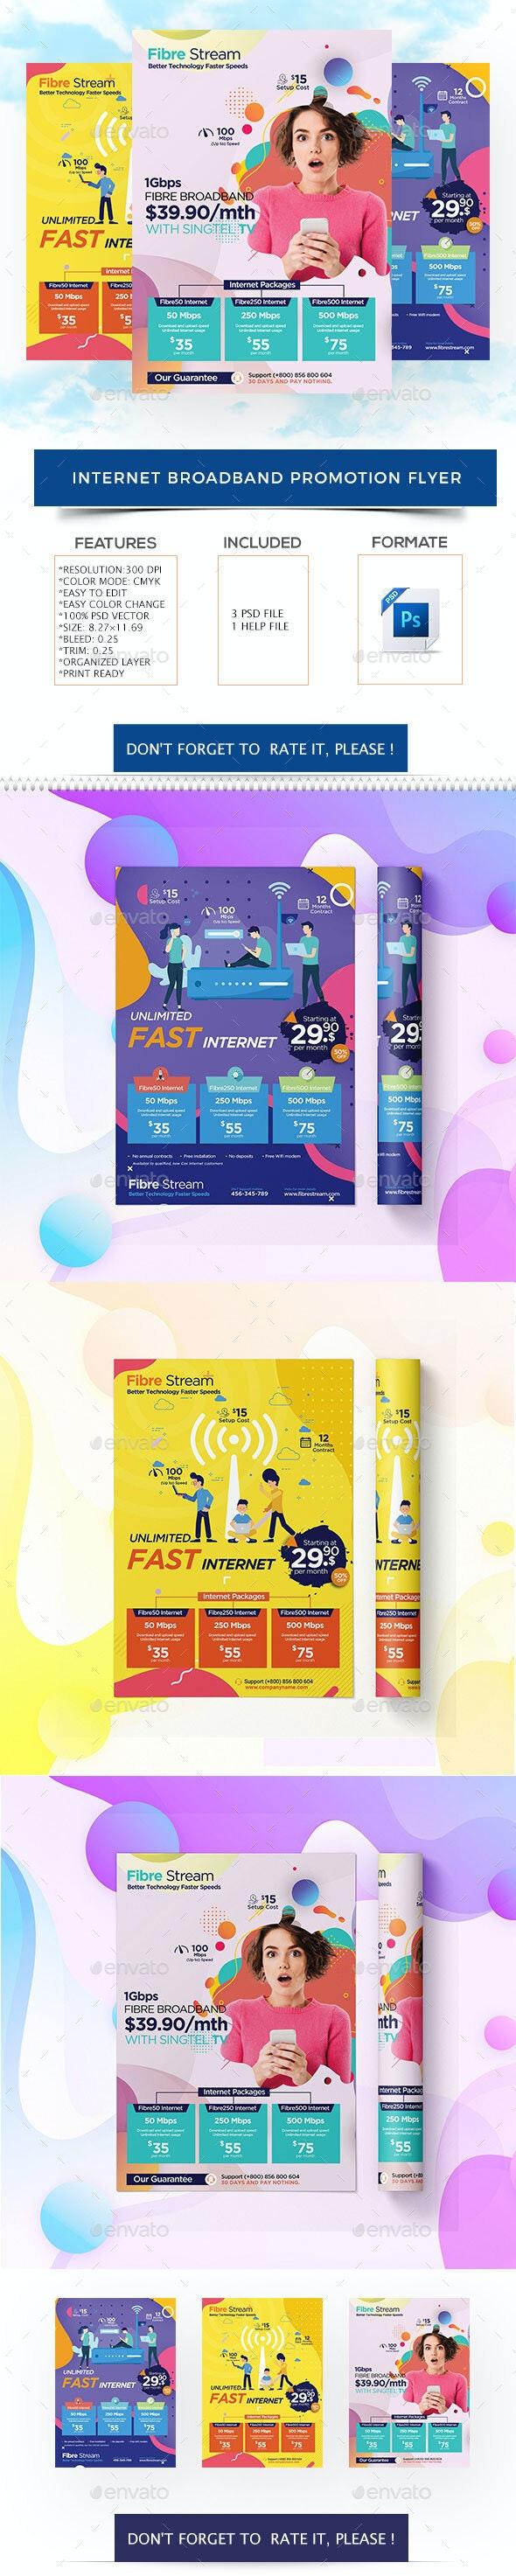 Internet Broadband Promotion Flyer - Flyers Print Templates